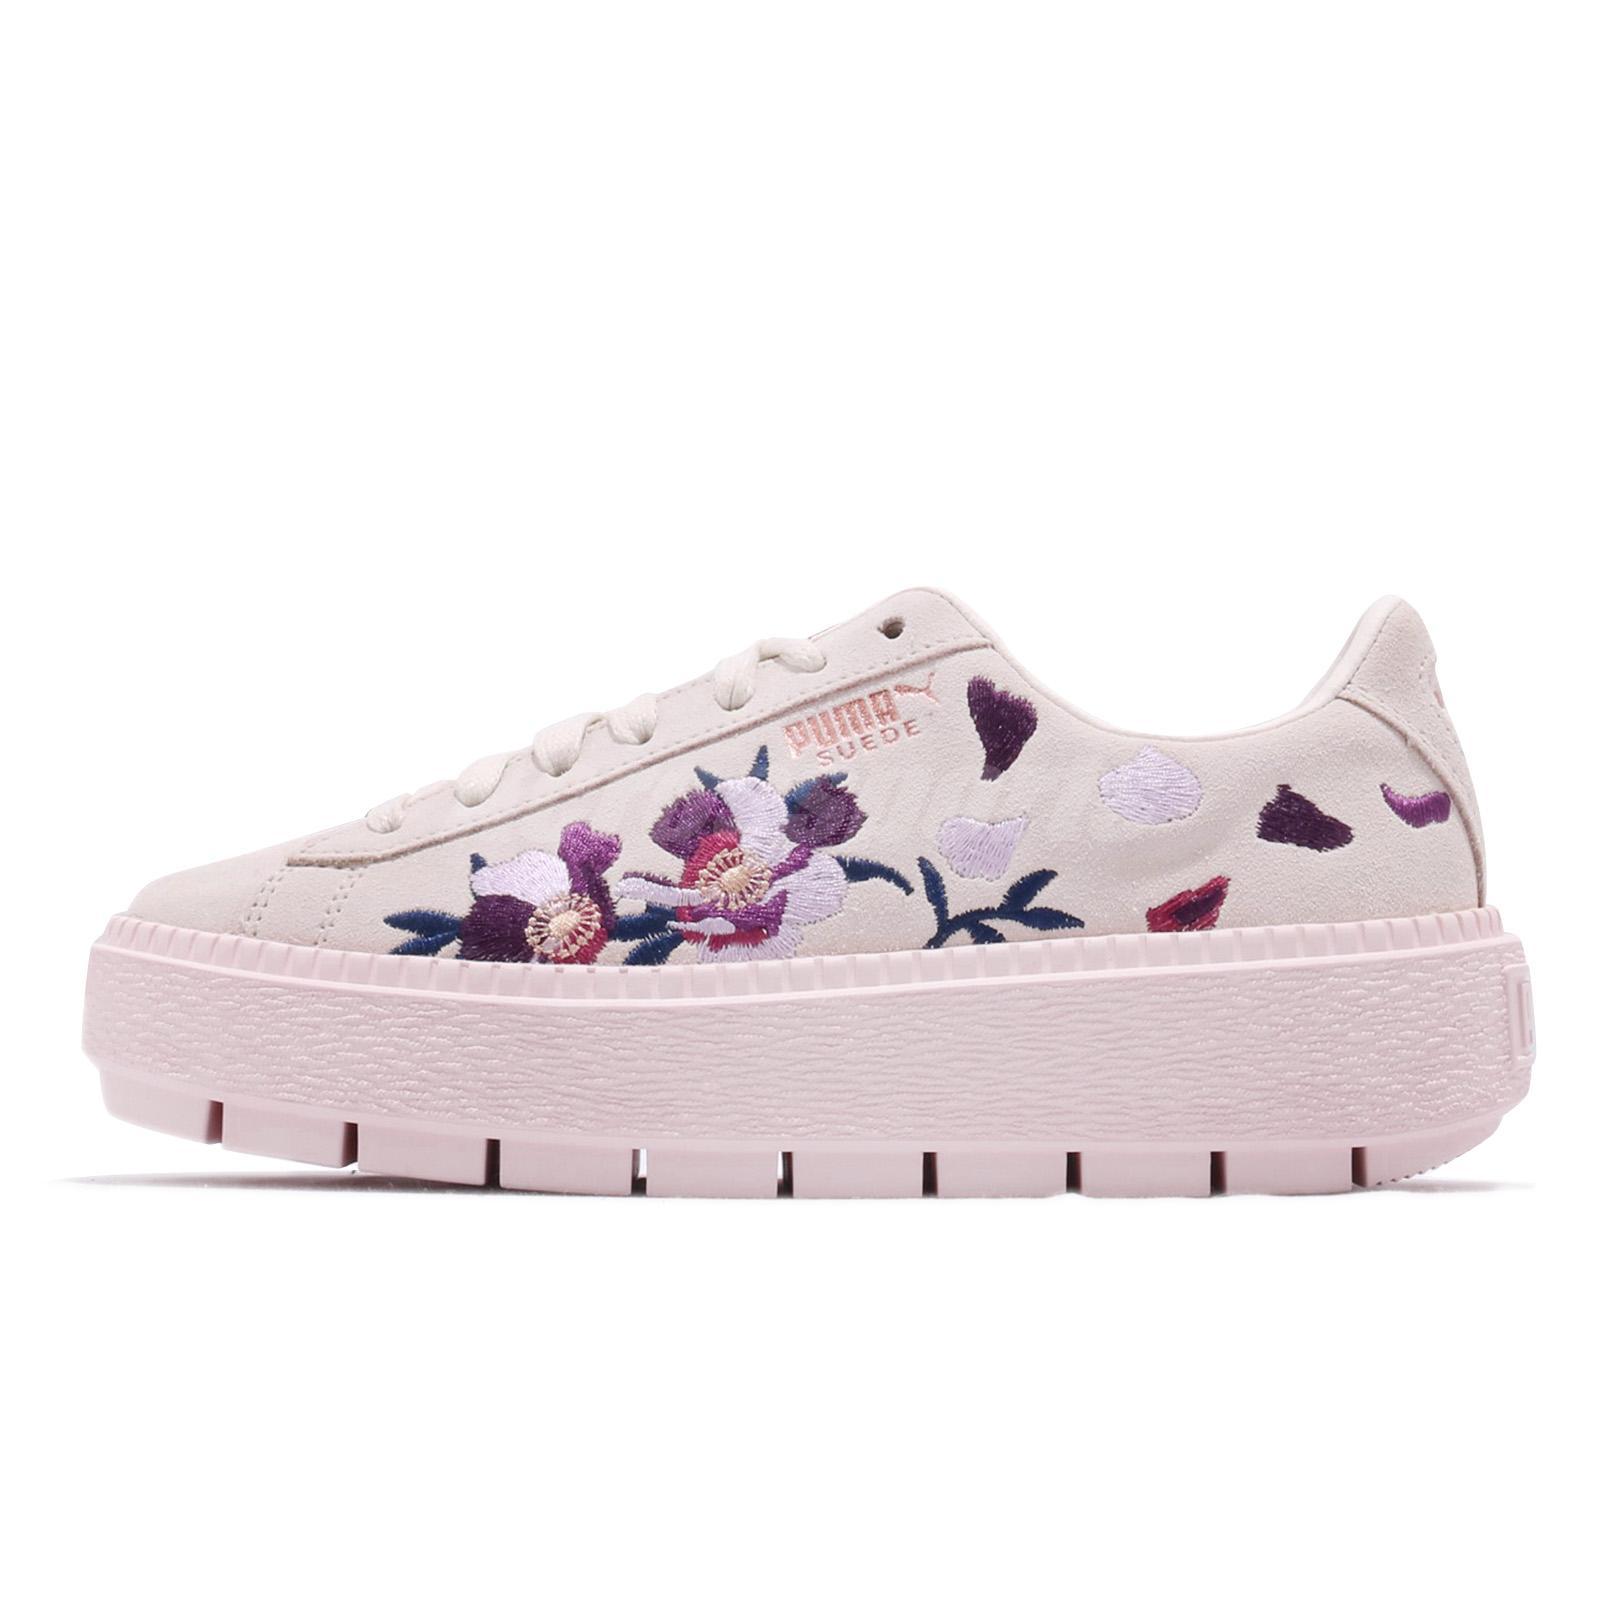 Puma Suede Platform Trace Flowery White Mauve Morn Rose Gold Women 367810-01 dd9dd85e9